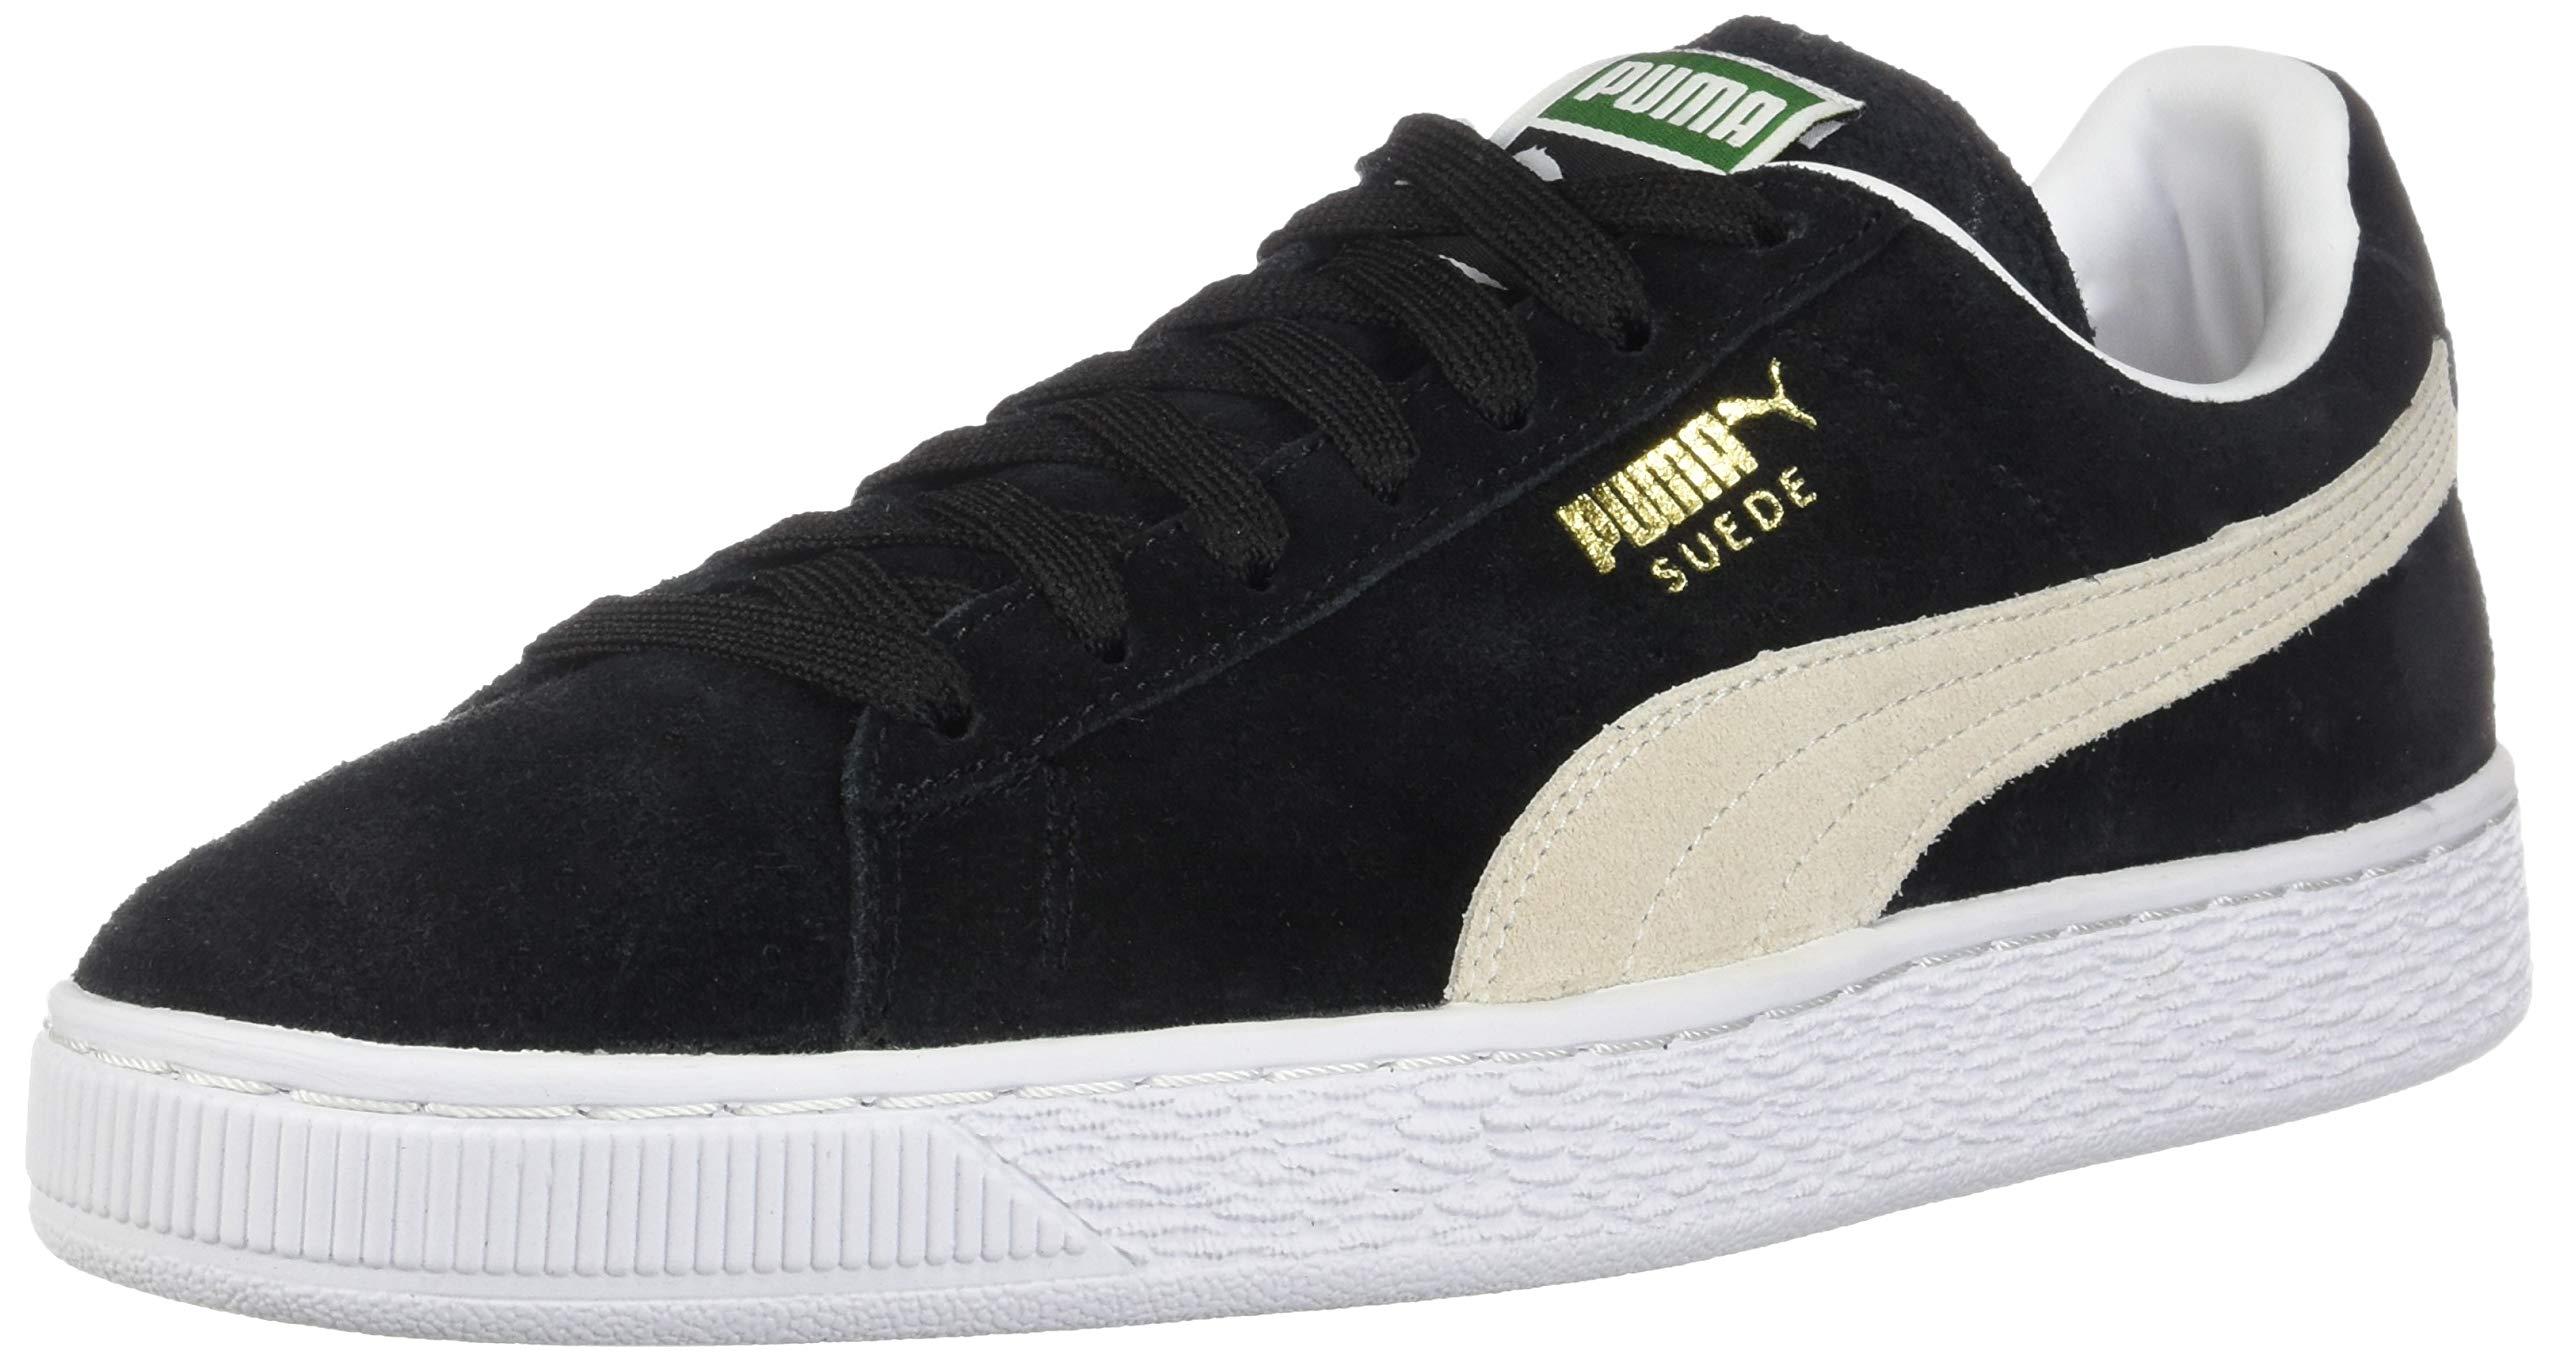 PUMA Suede Classic Sneaker, Black/White, 6 M US Men's